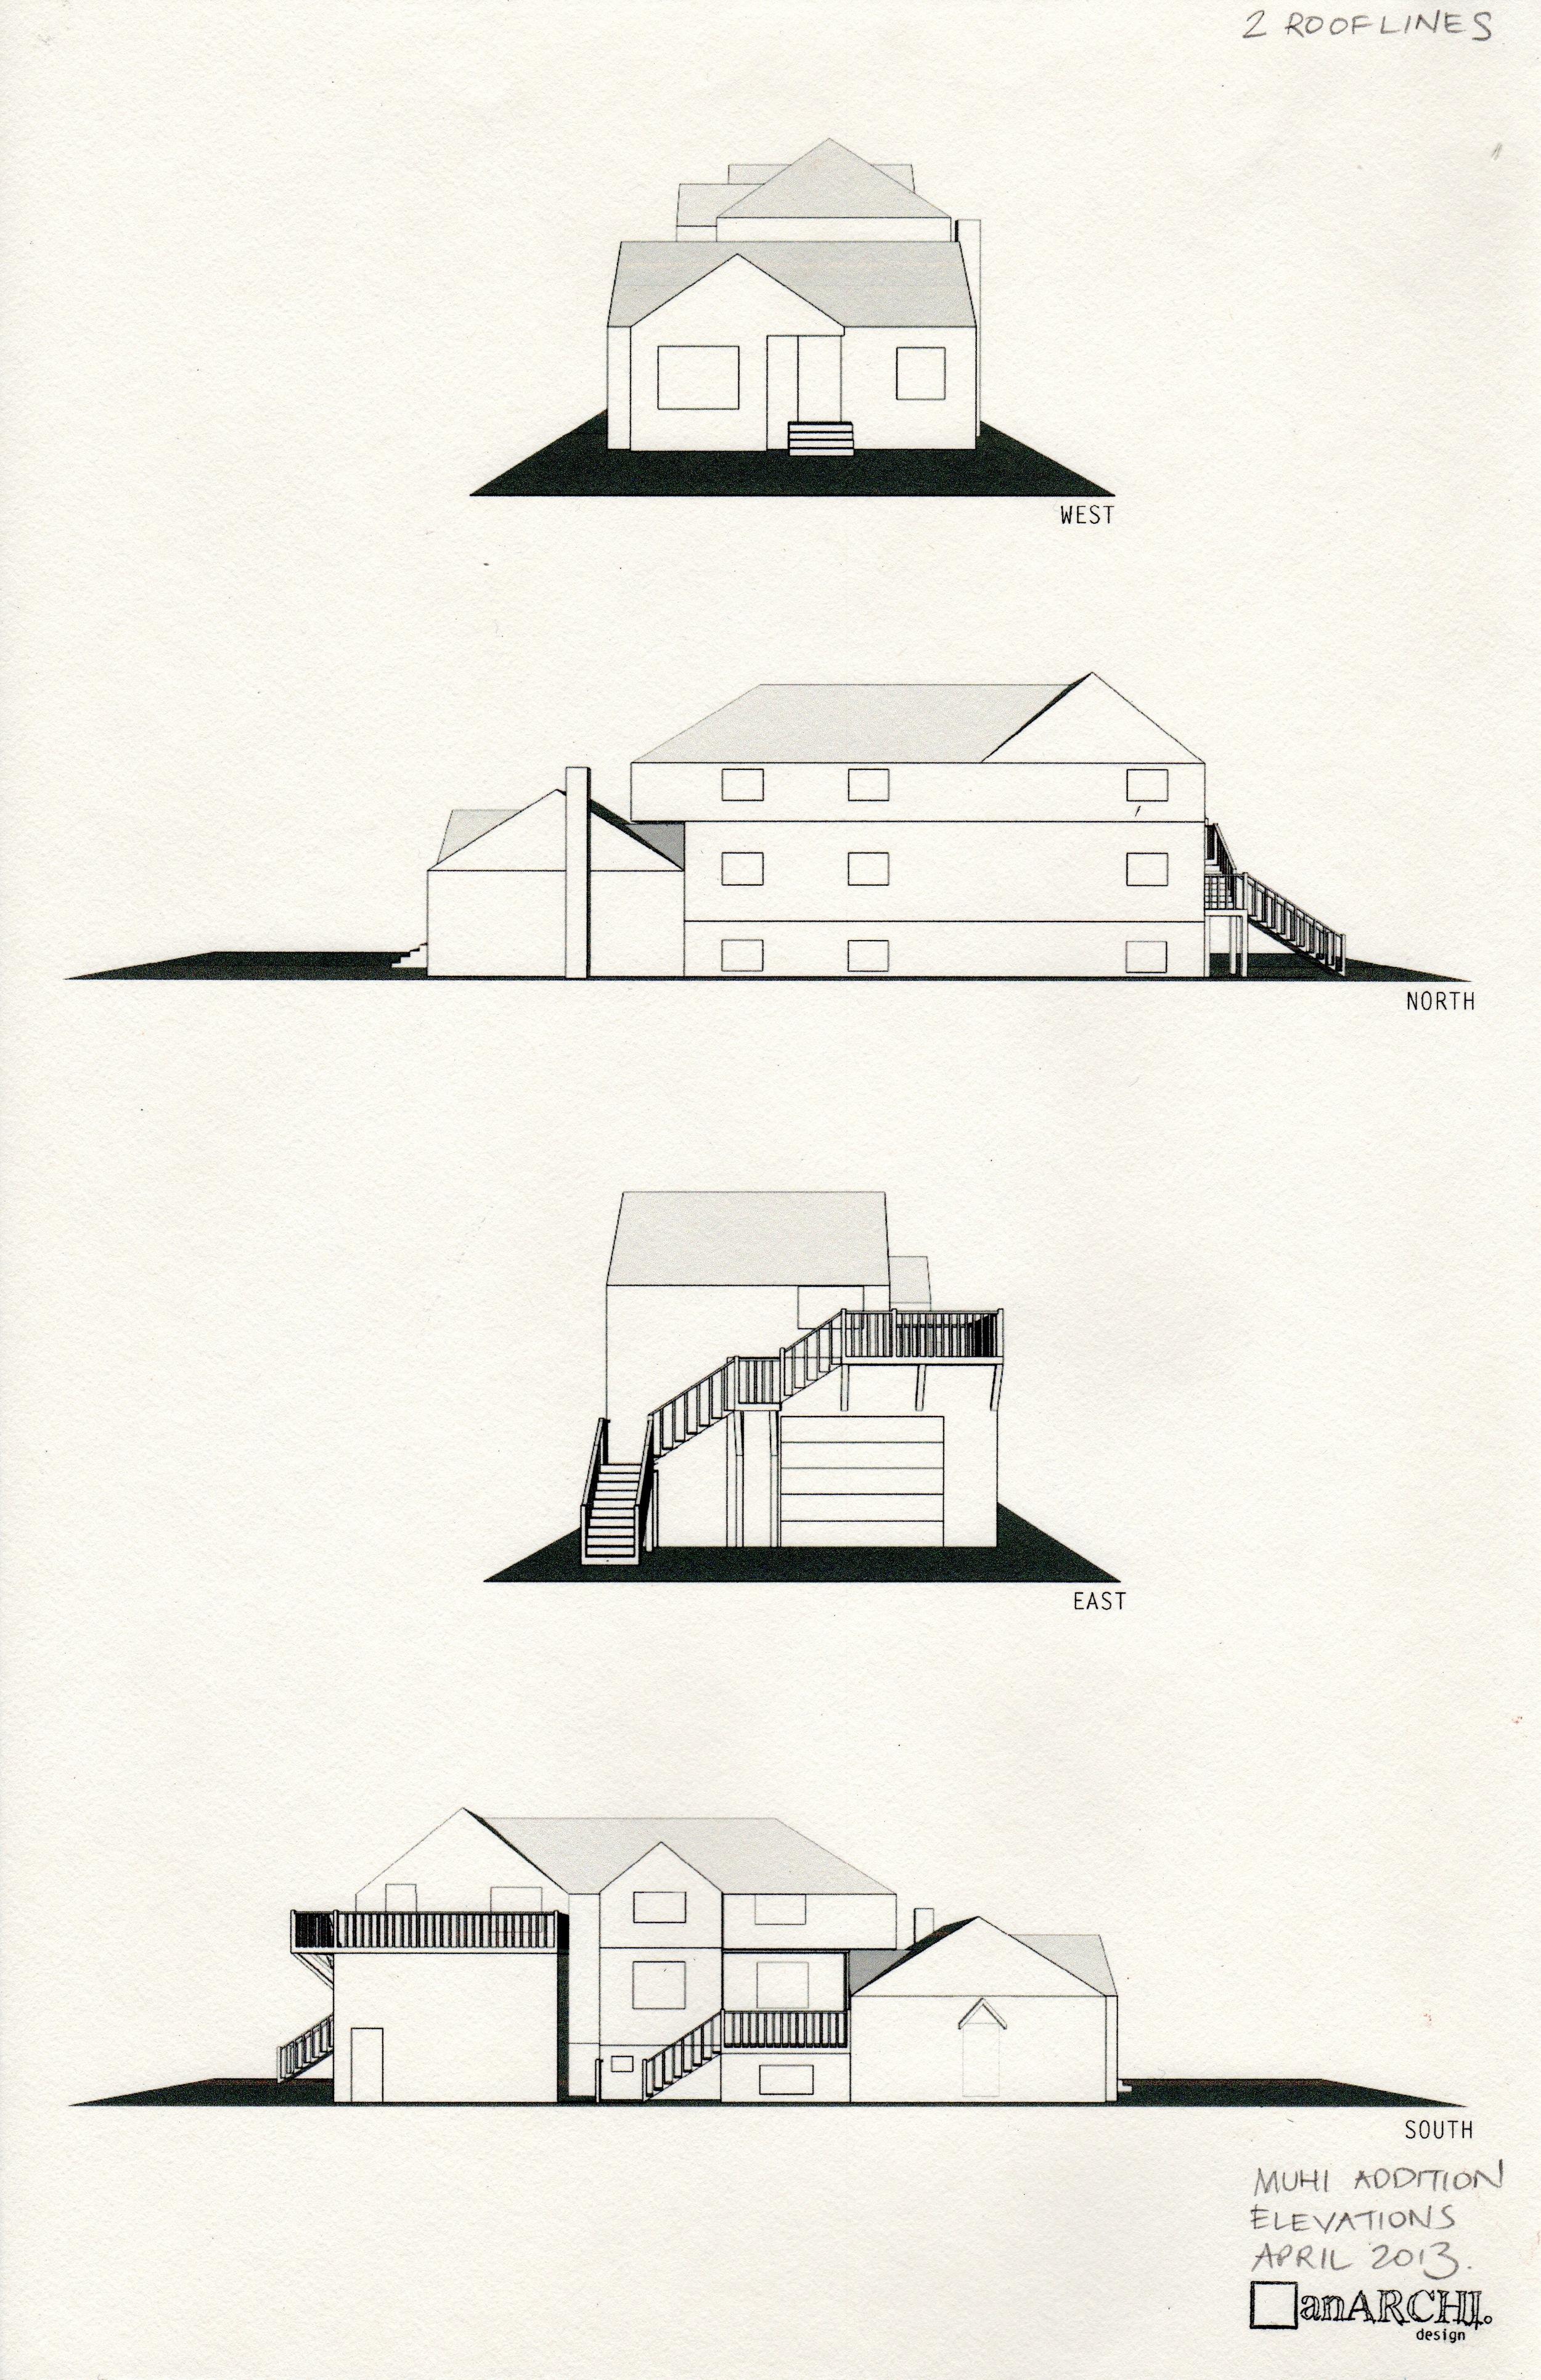 Design 4 - elevational views